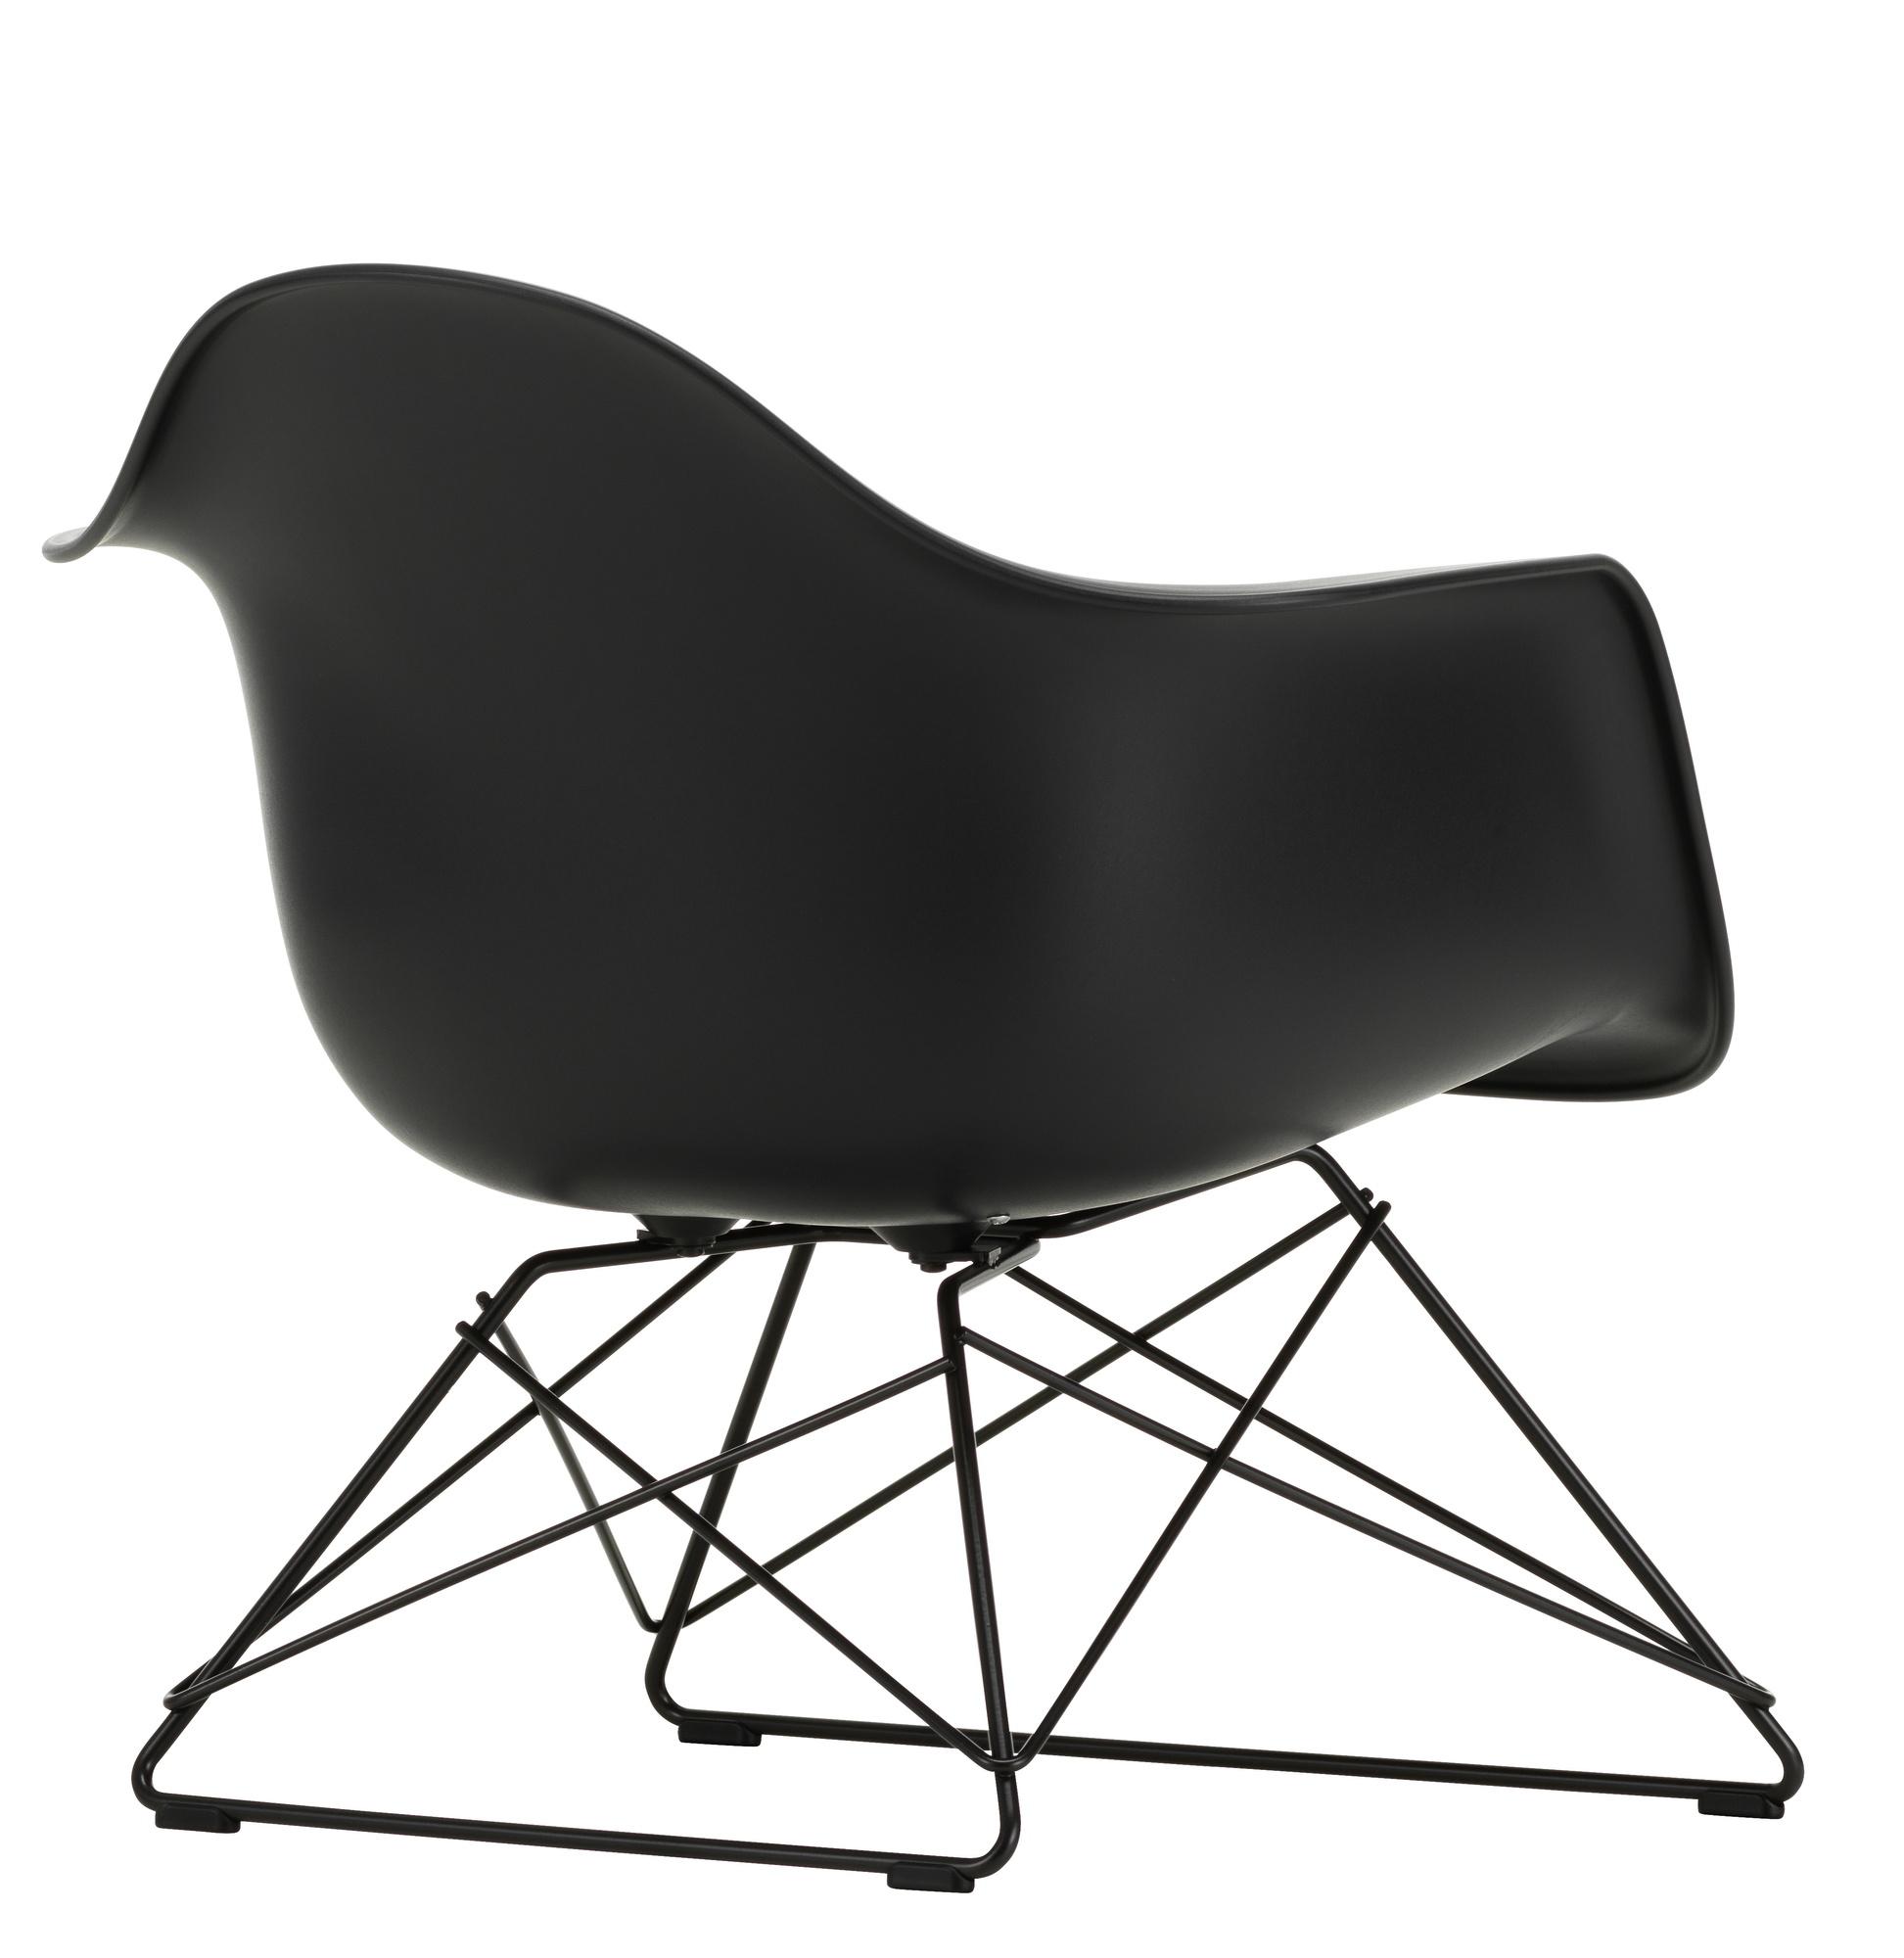 Eames Fiberglass Chair DSW Vitra Maple black - Sea foam green